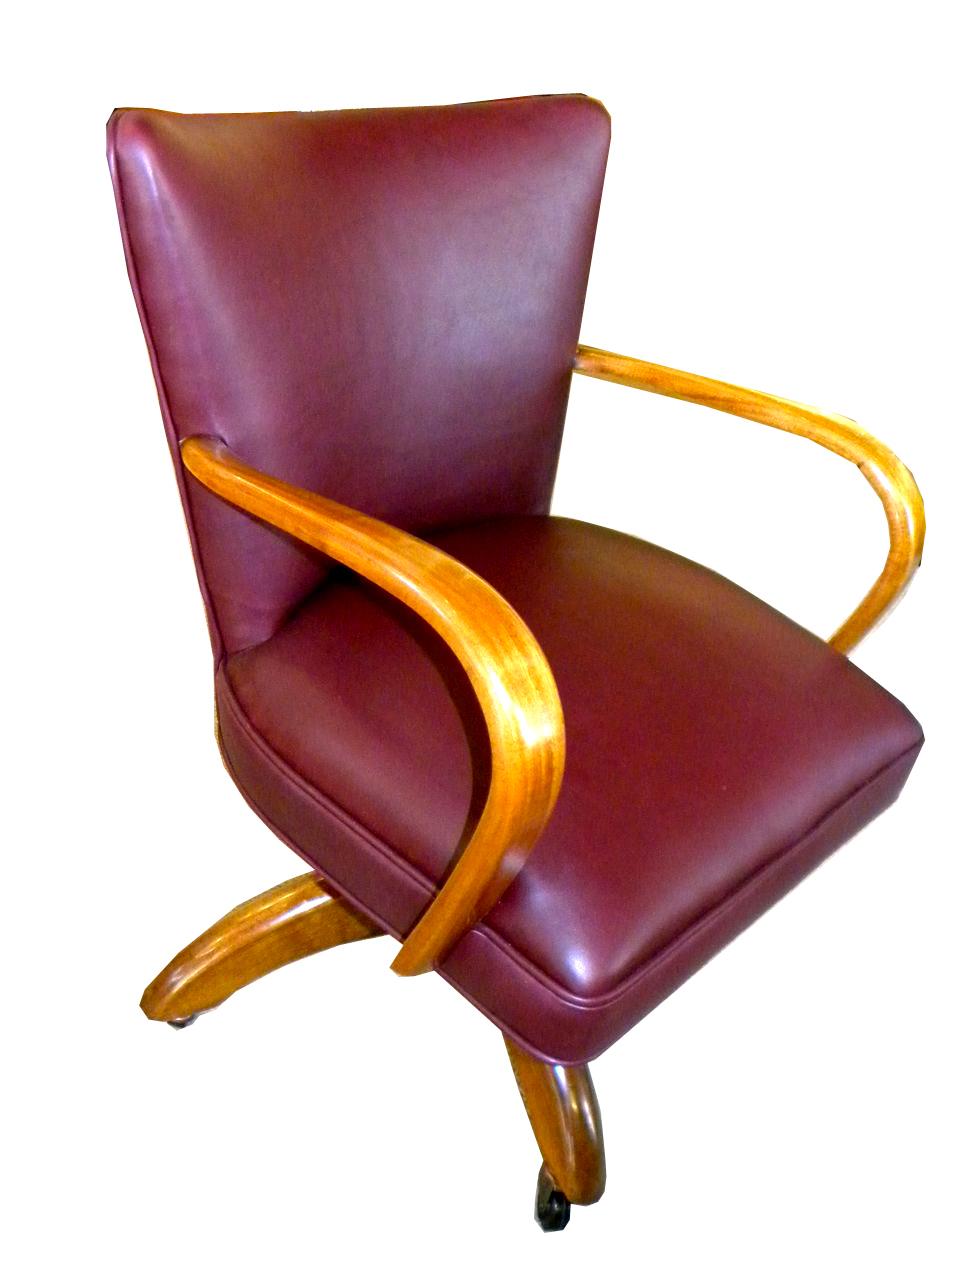 Original European Art Deco Executive Desk Chair Modernism